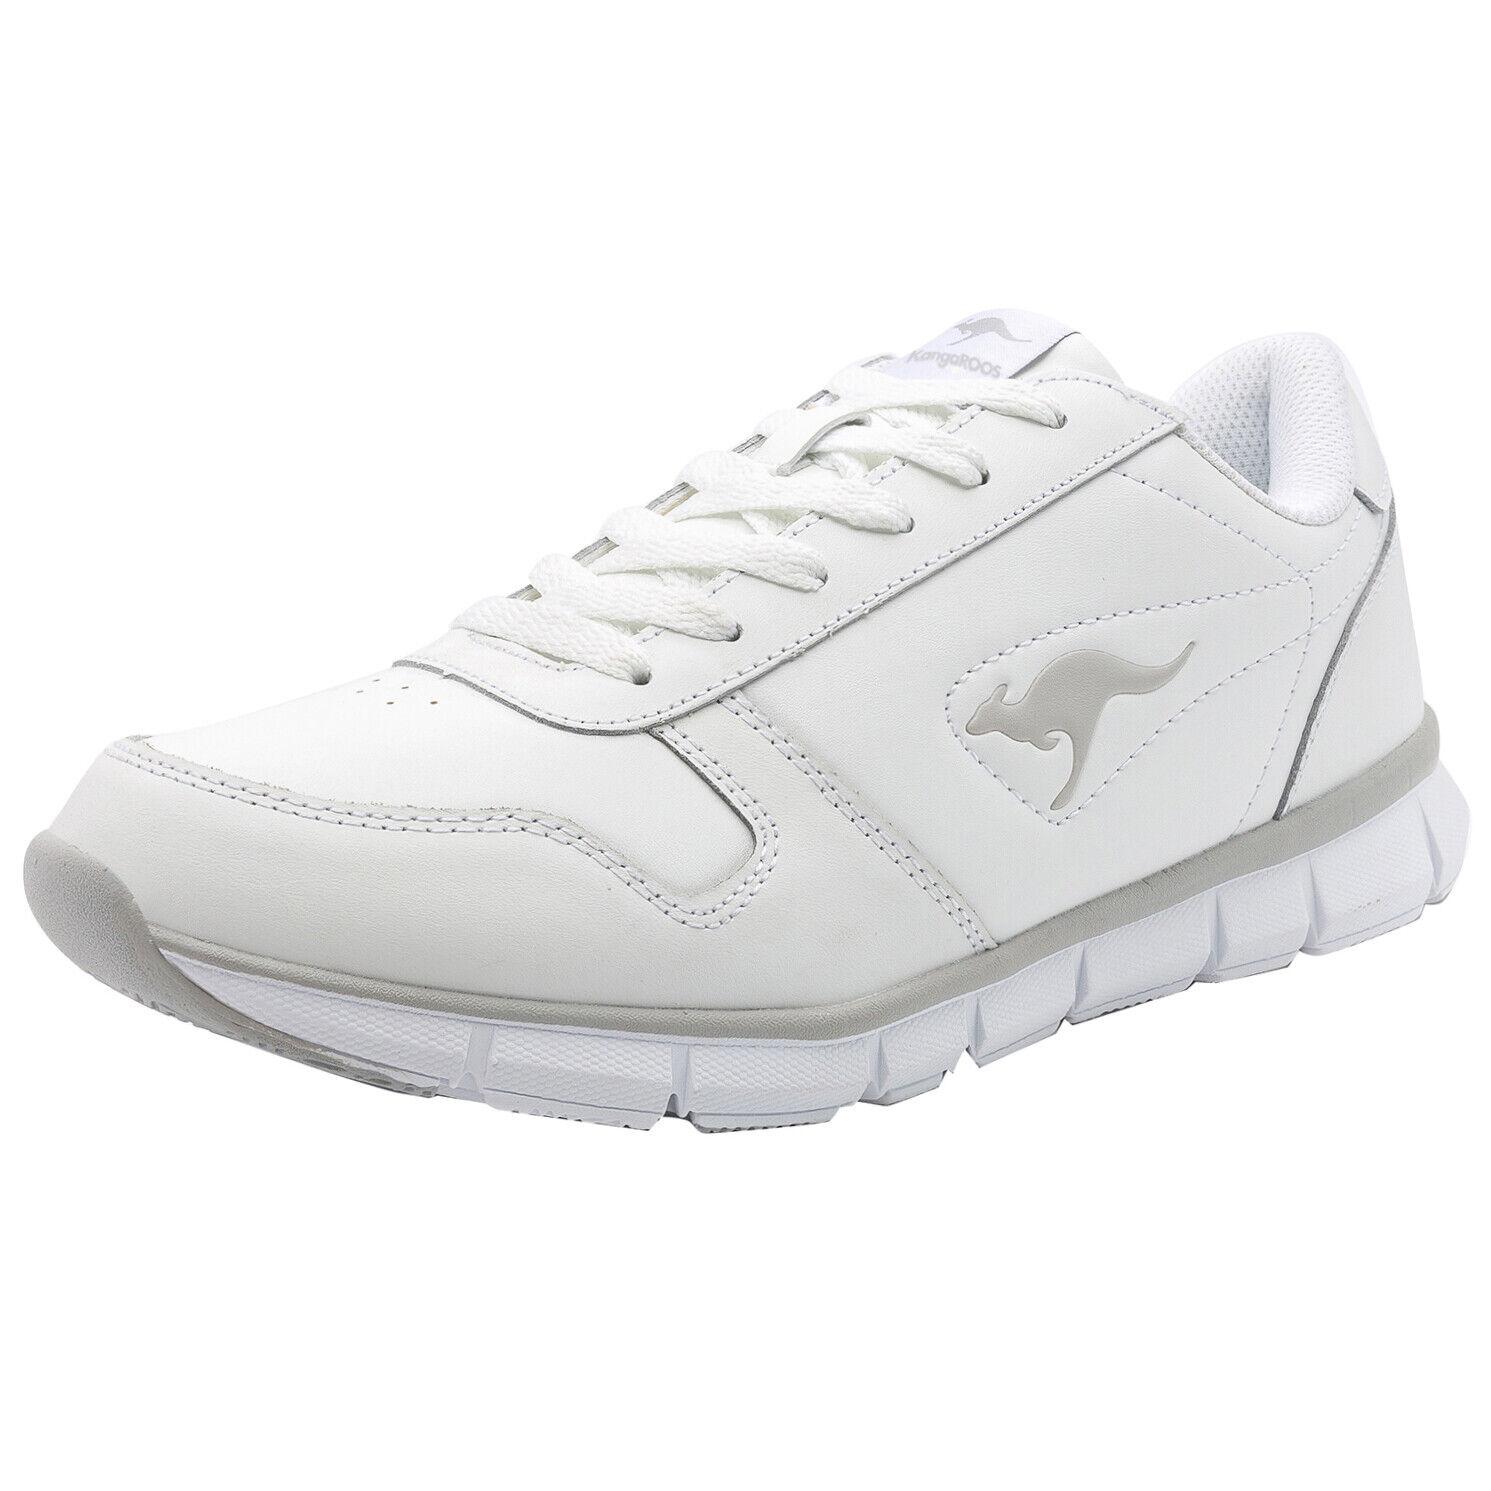 KANGAROOS HERREN SPORTSCHUHE Turnschuhe Sneaker 16082.590 Gr